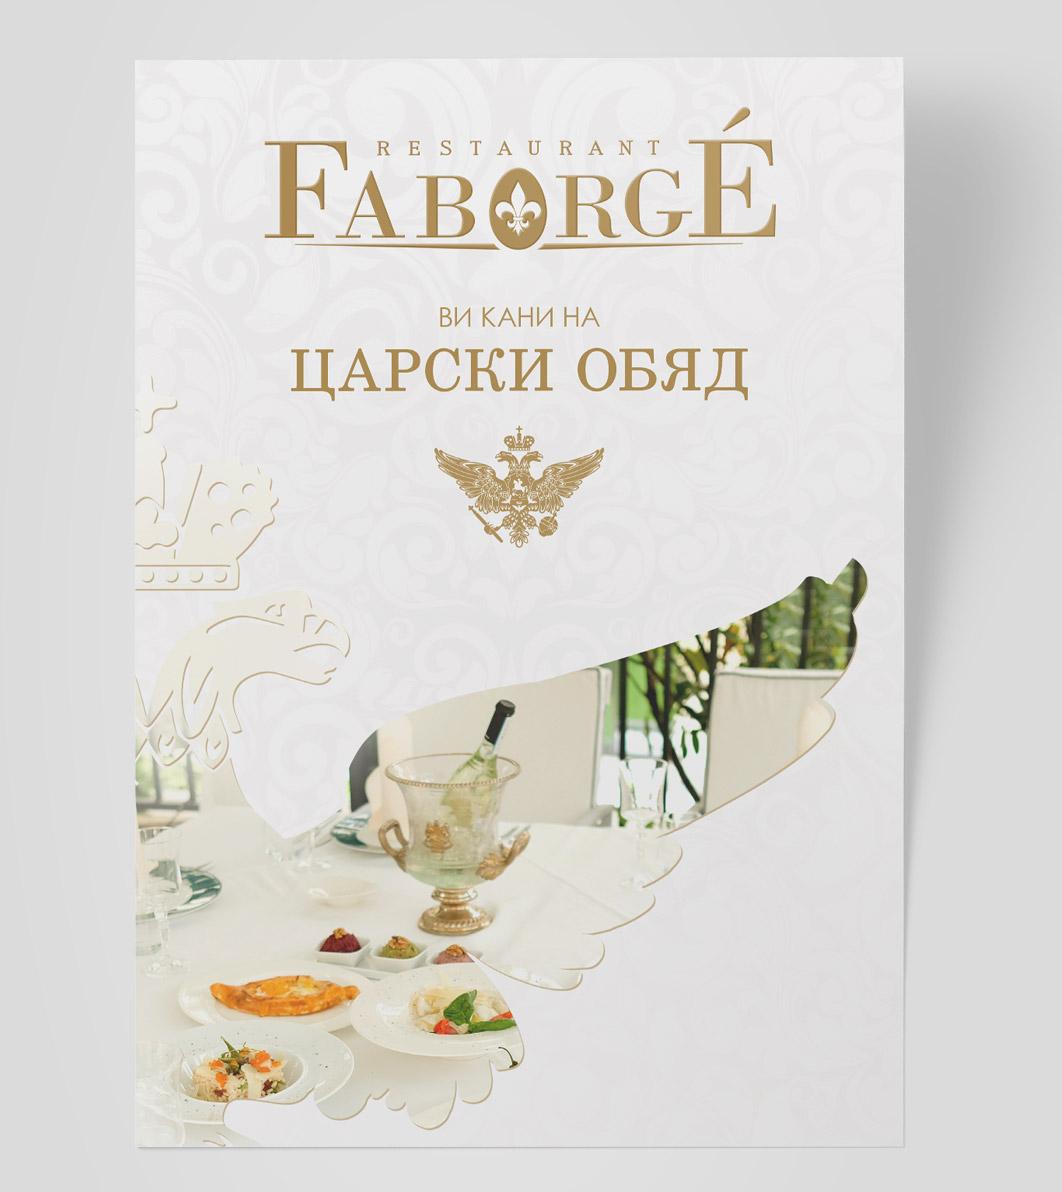 Дизайн на флаер ресторант Faborge